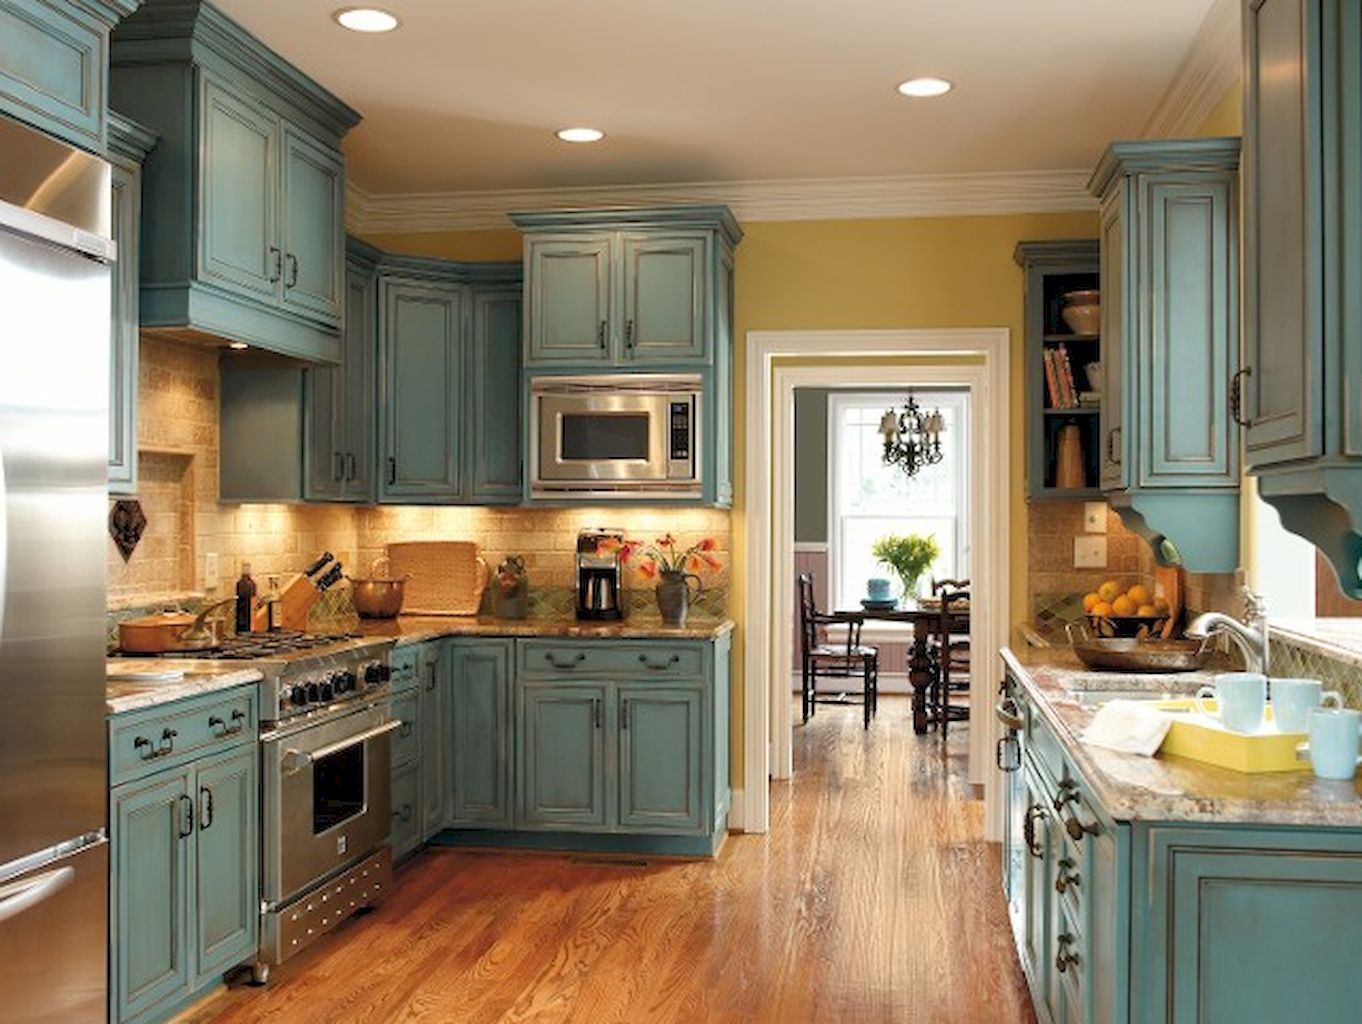 90 rustic kitchen farmhouse style ideas 5